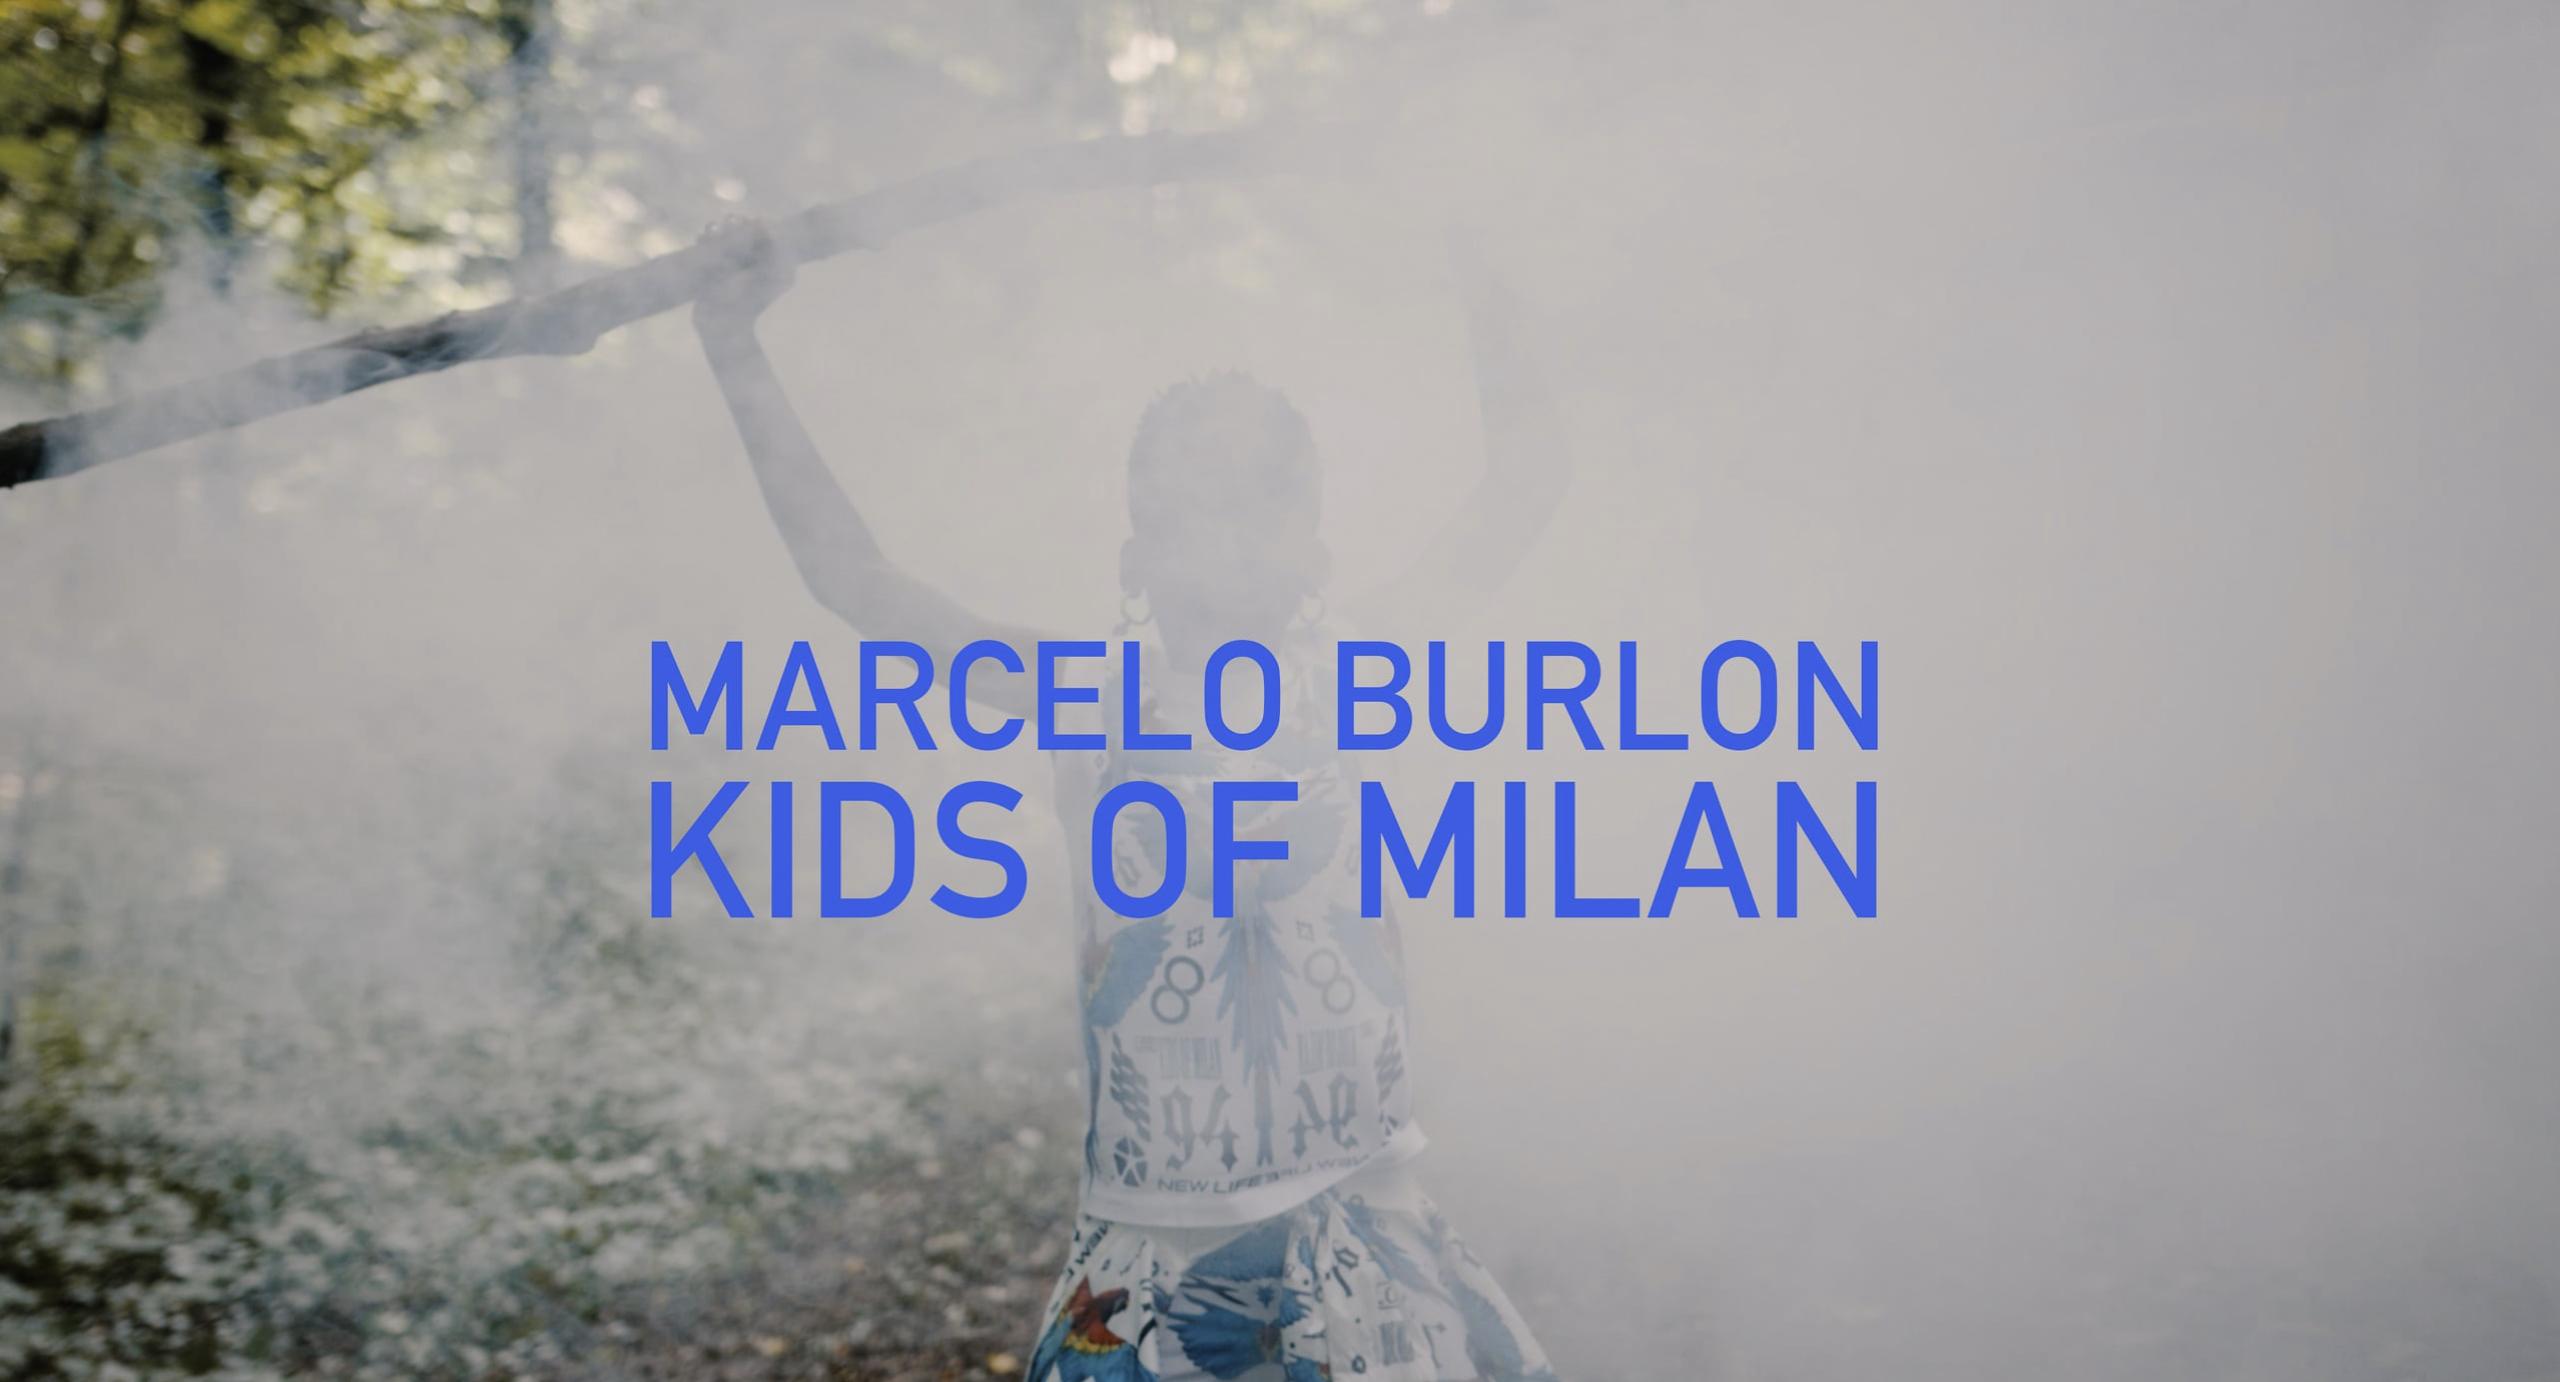 Alexander Basile for Marcelo Burlon